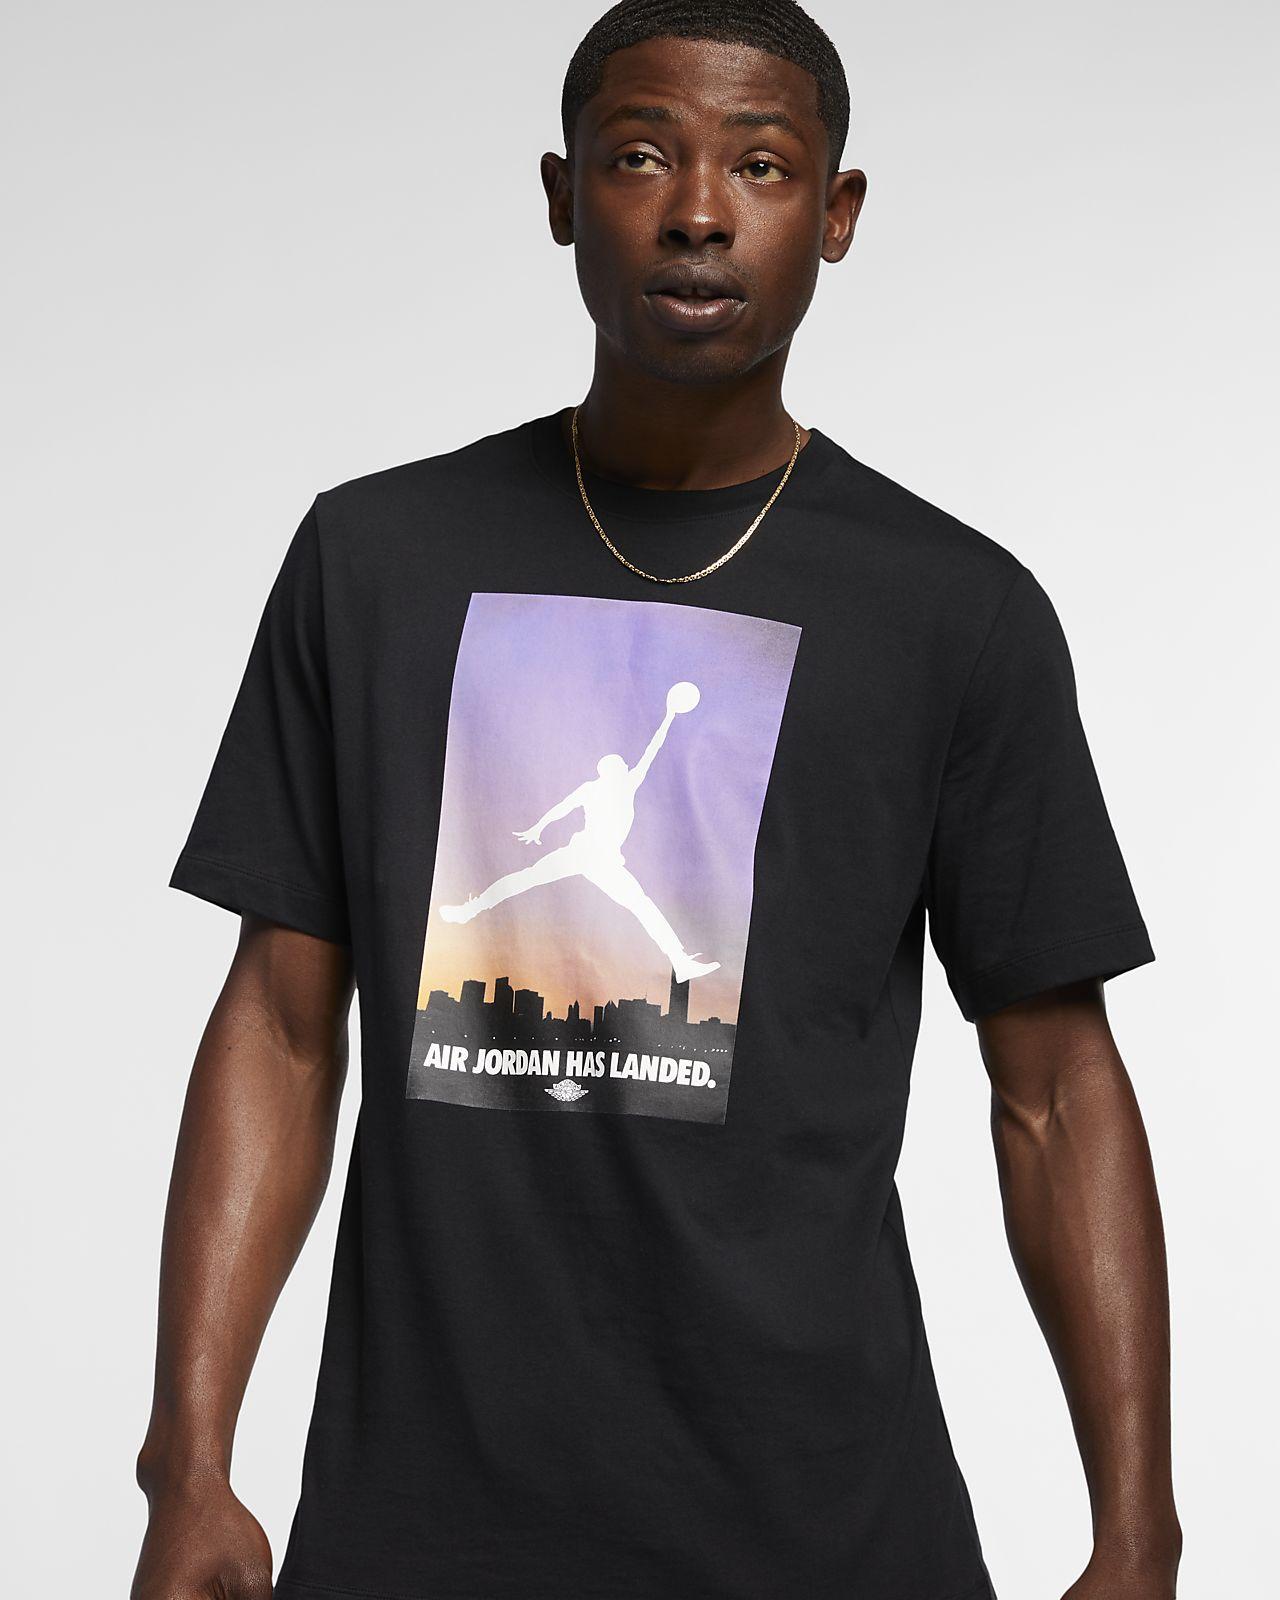 a4667fe54ca6 Air Jordan 23 Men s T-Shirt. Nike.com